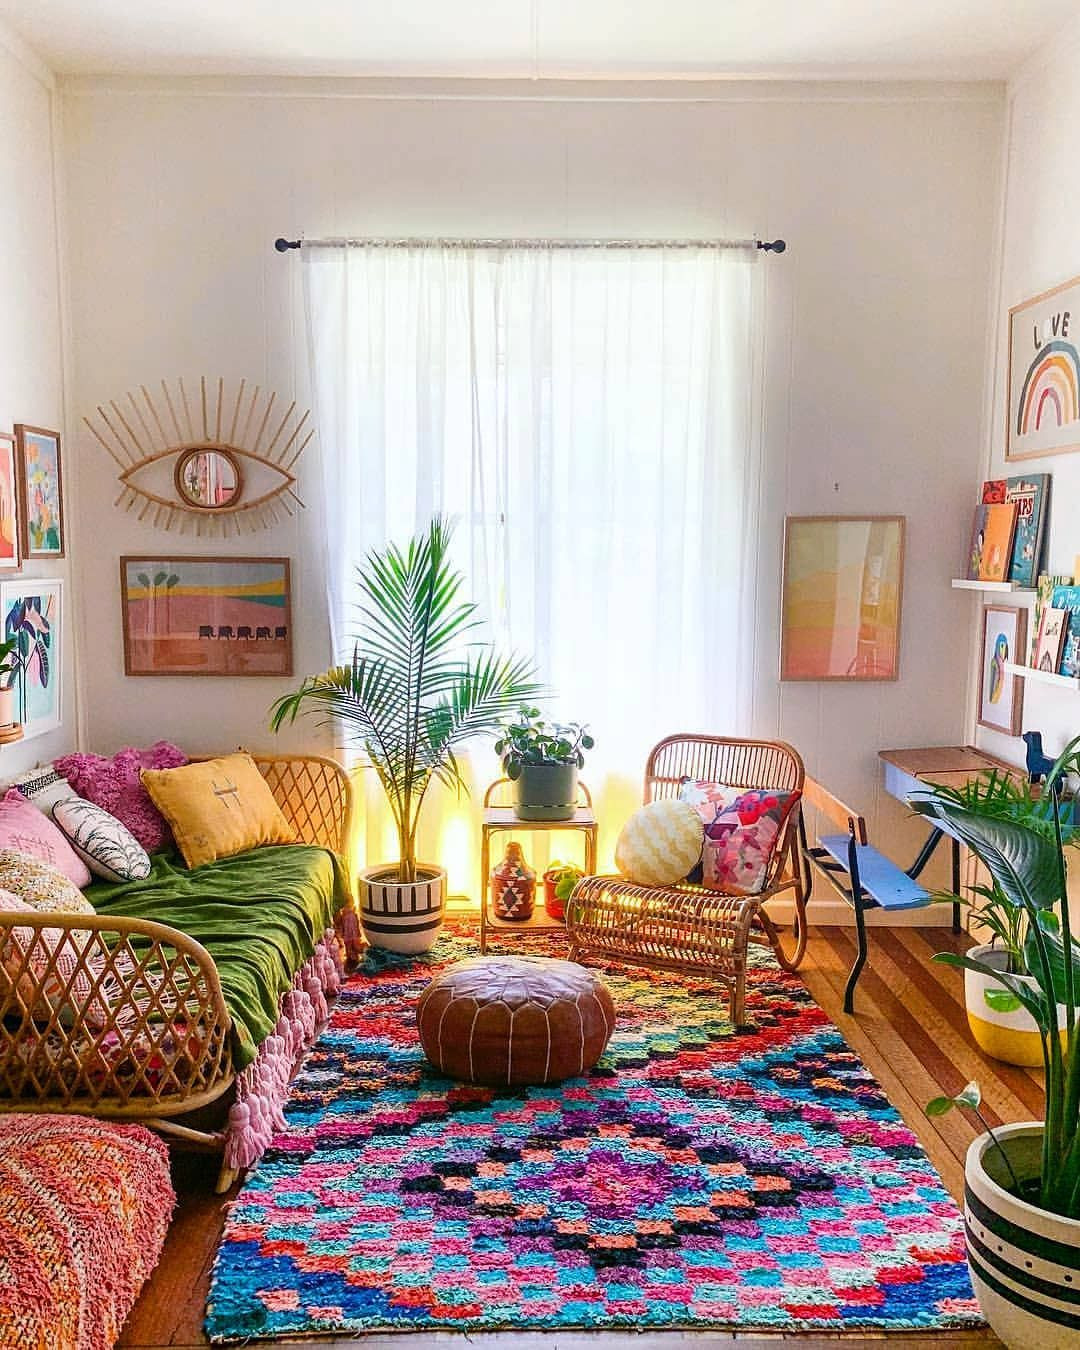 Pin By Manish Gusain On Furniture Bohemian Living Room Decor Rugs In Living Room Boho Living Room Decor